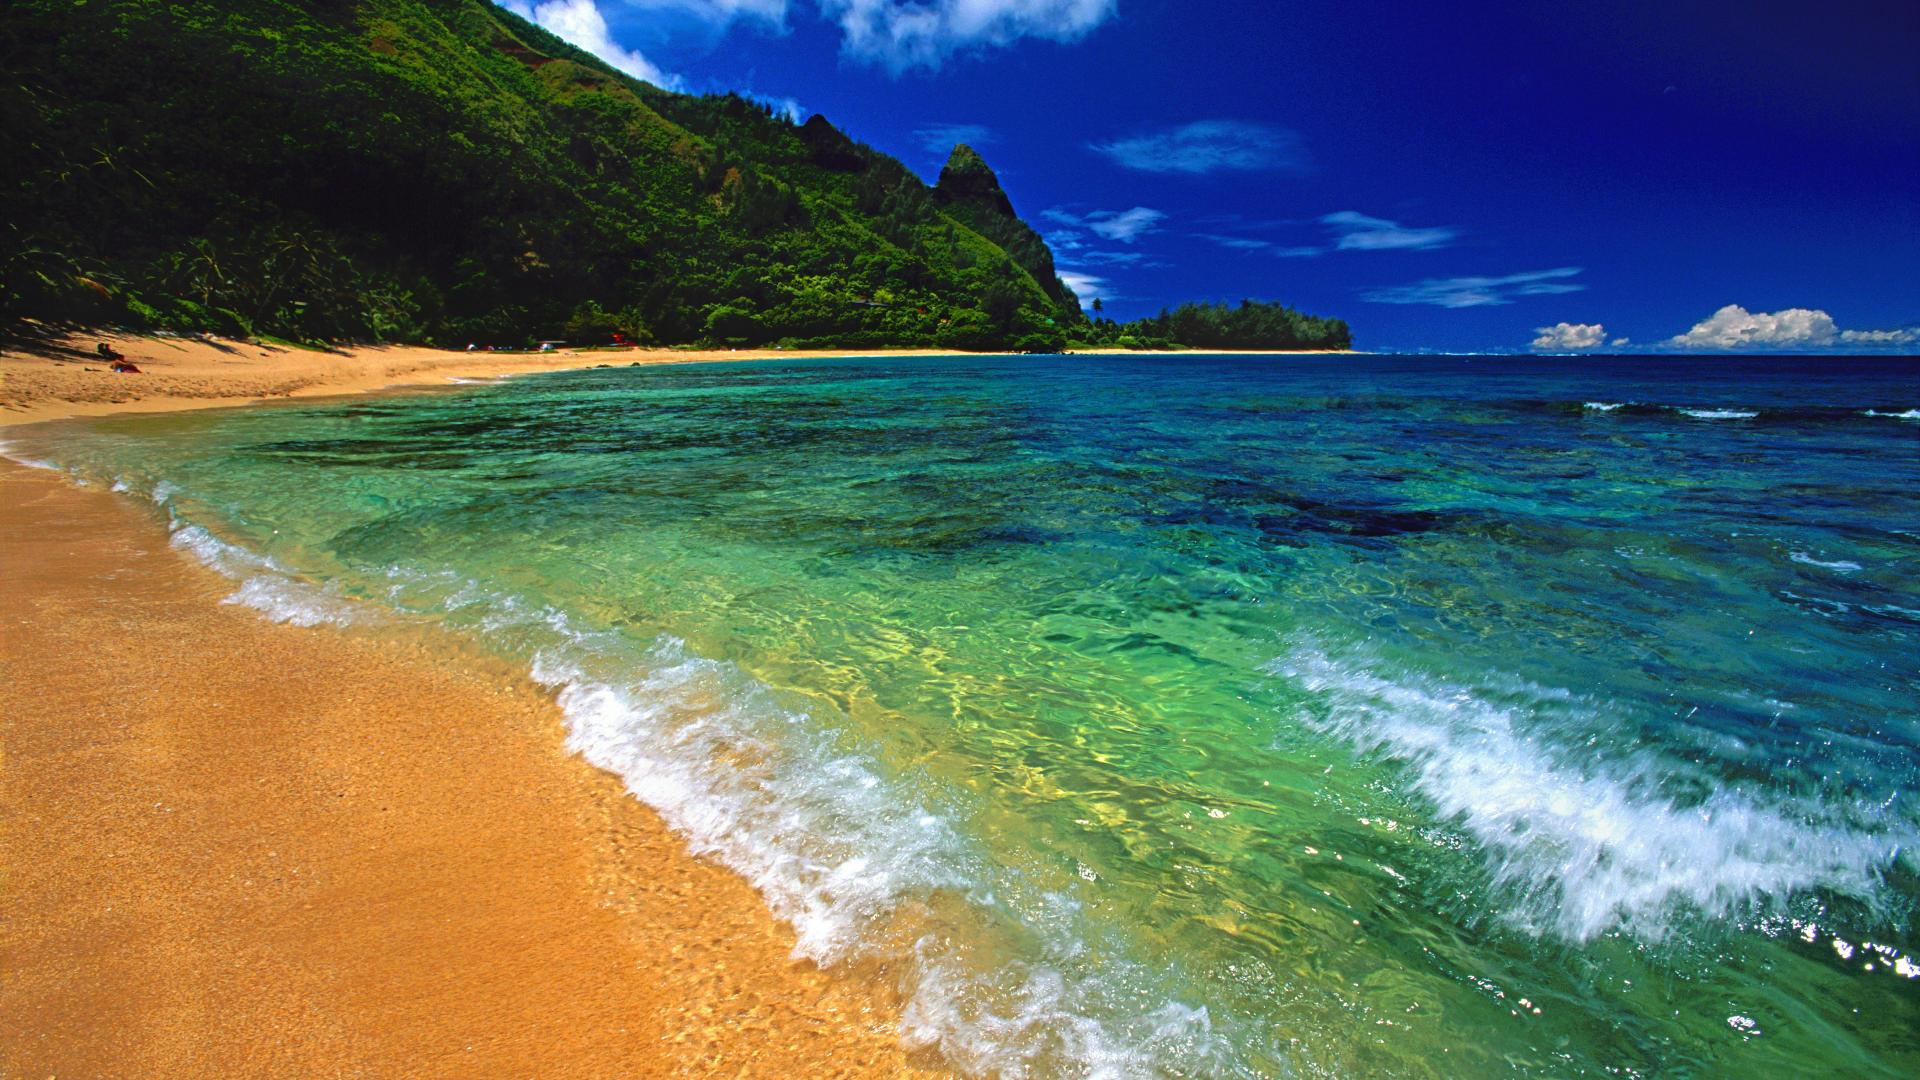 download Beach Desktop Backgrounds and Wallpaper Tunnels 1920x1080